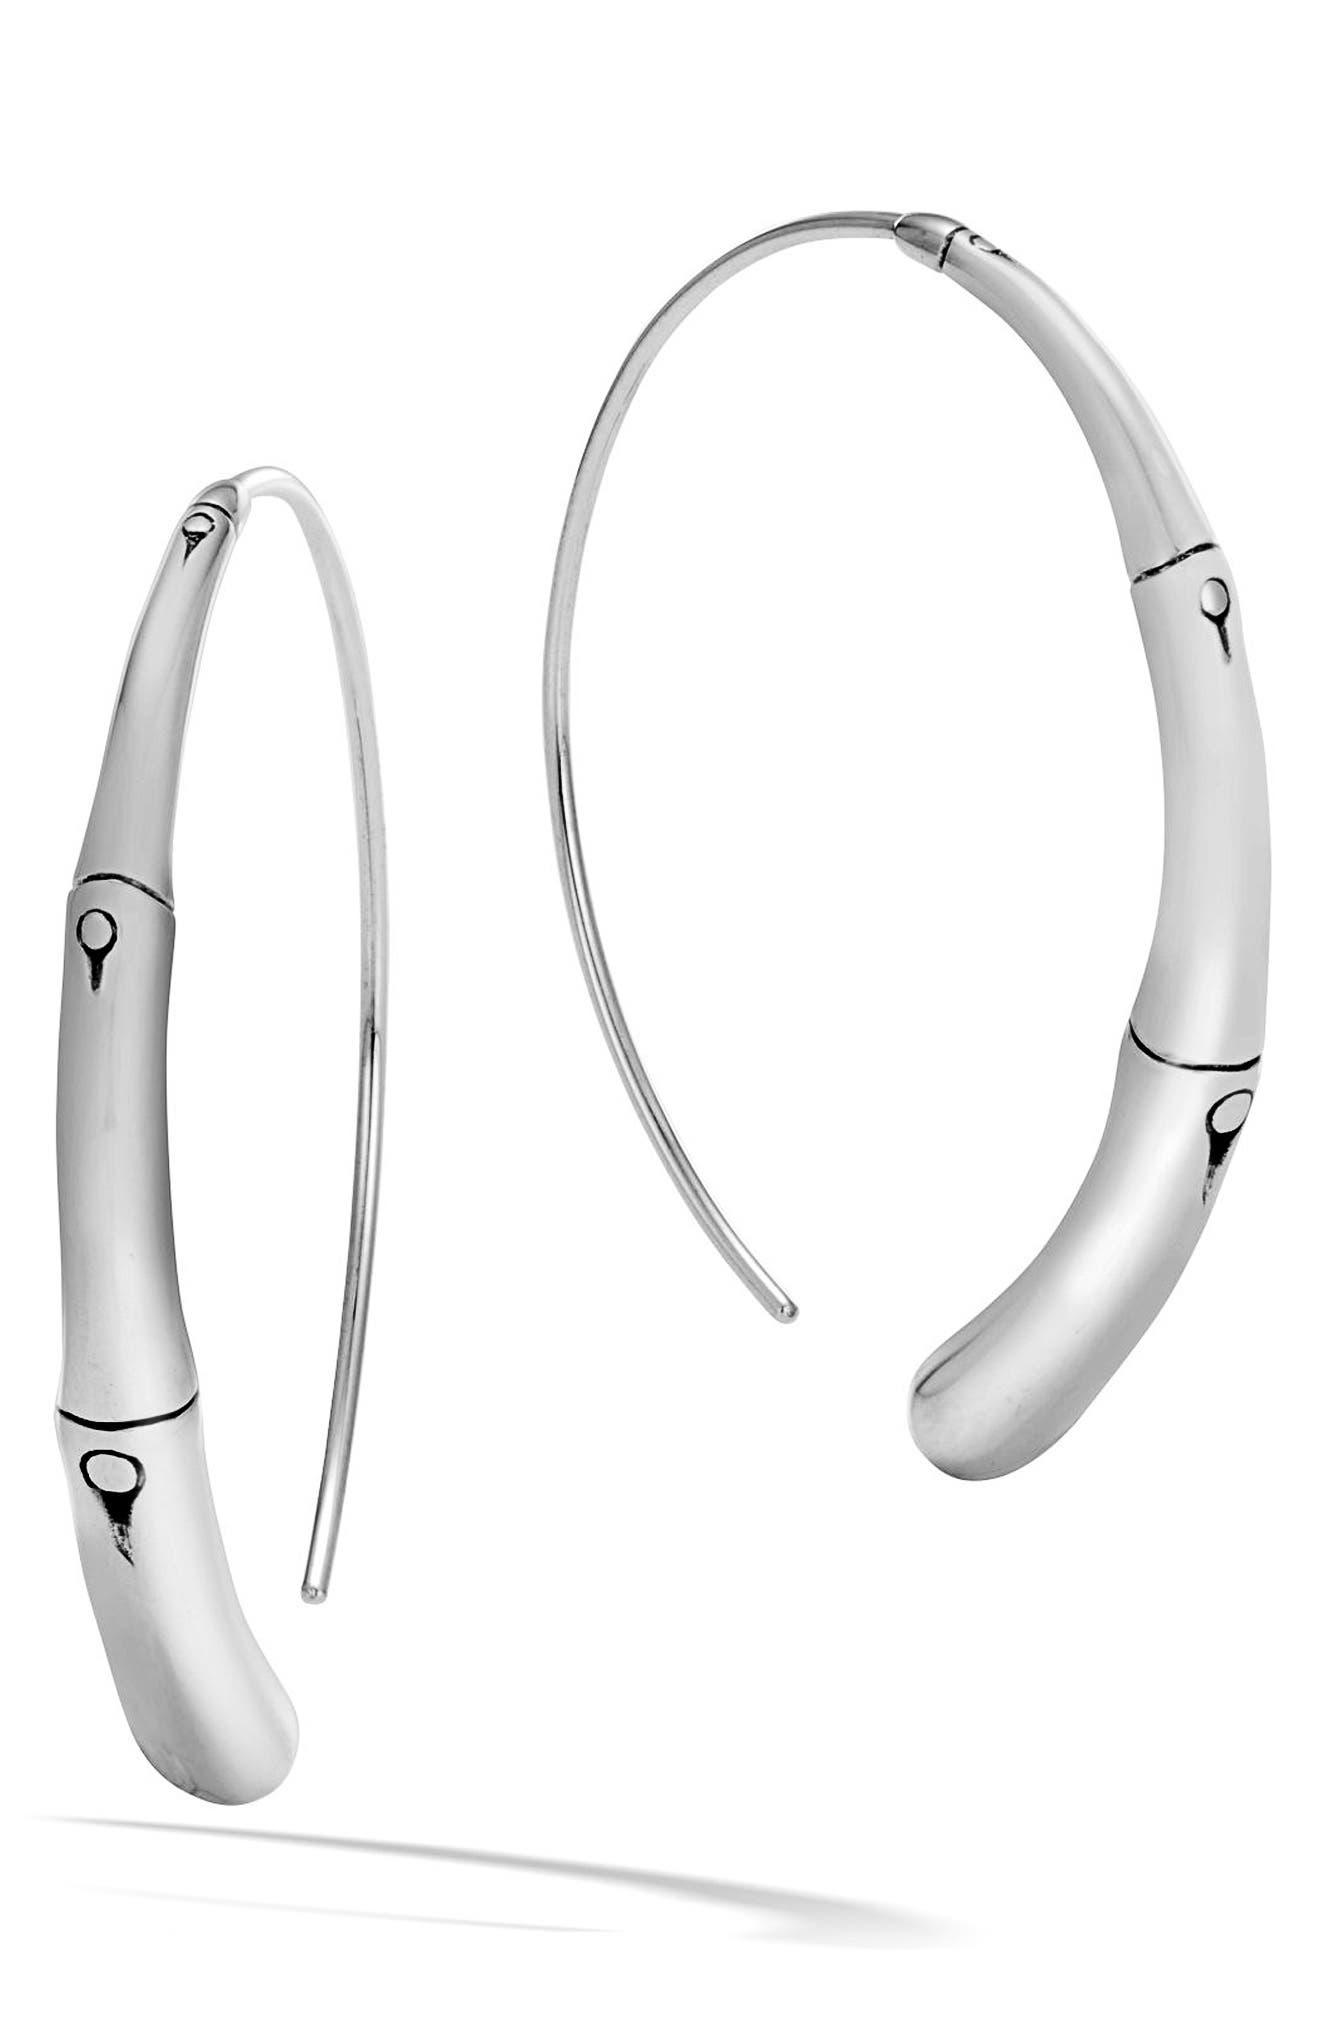 JOHN HARDY Bamboo Large Hoop Earrings, Main, color, SILVER